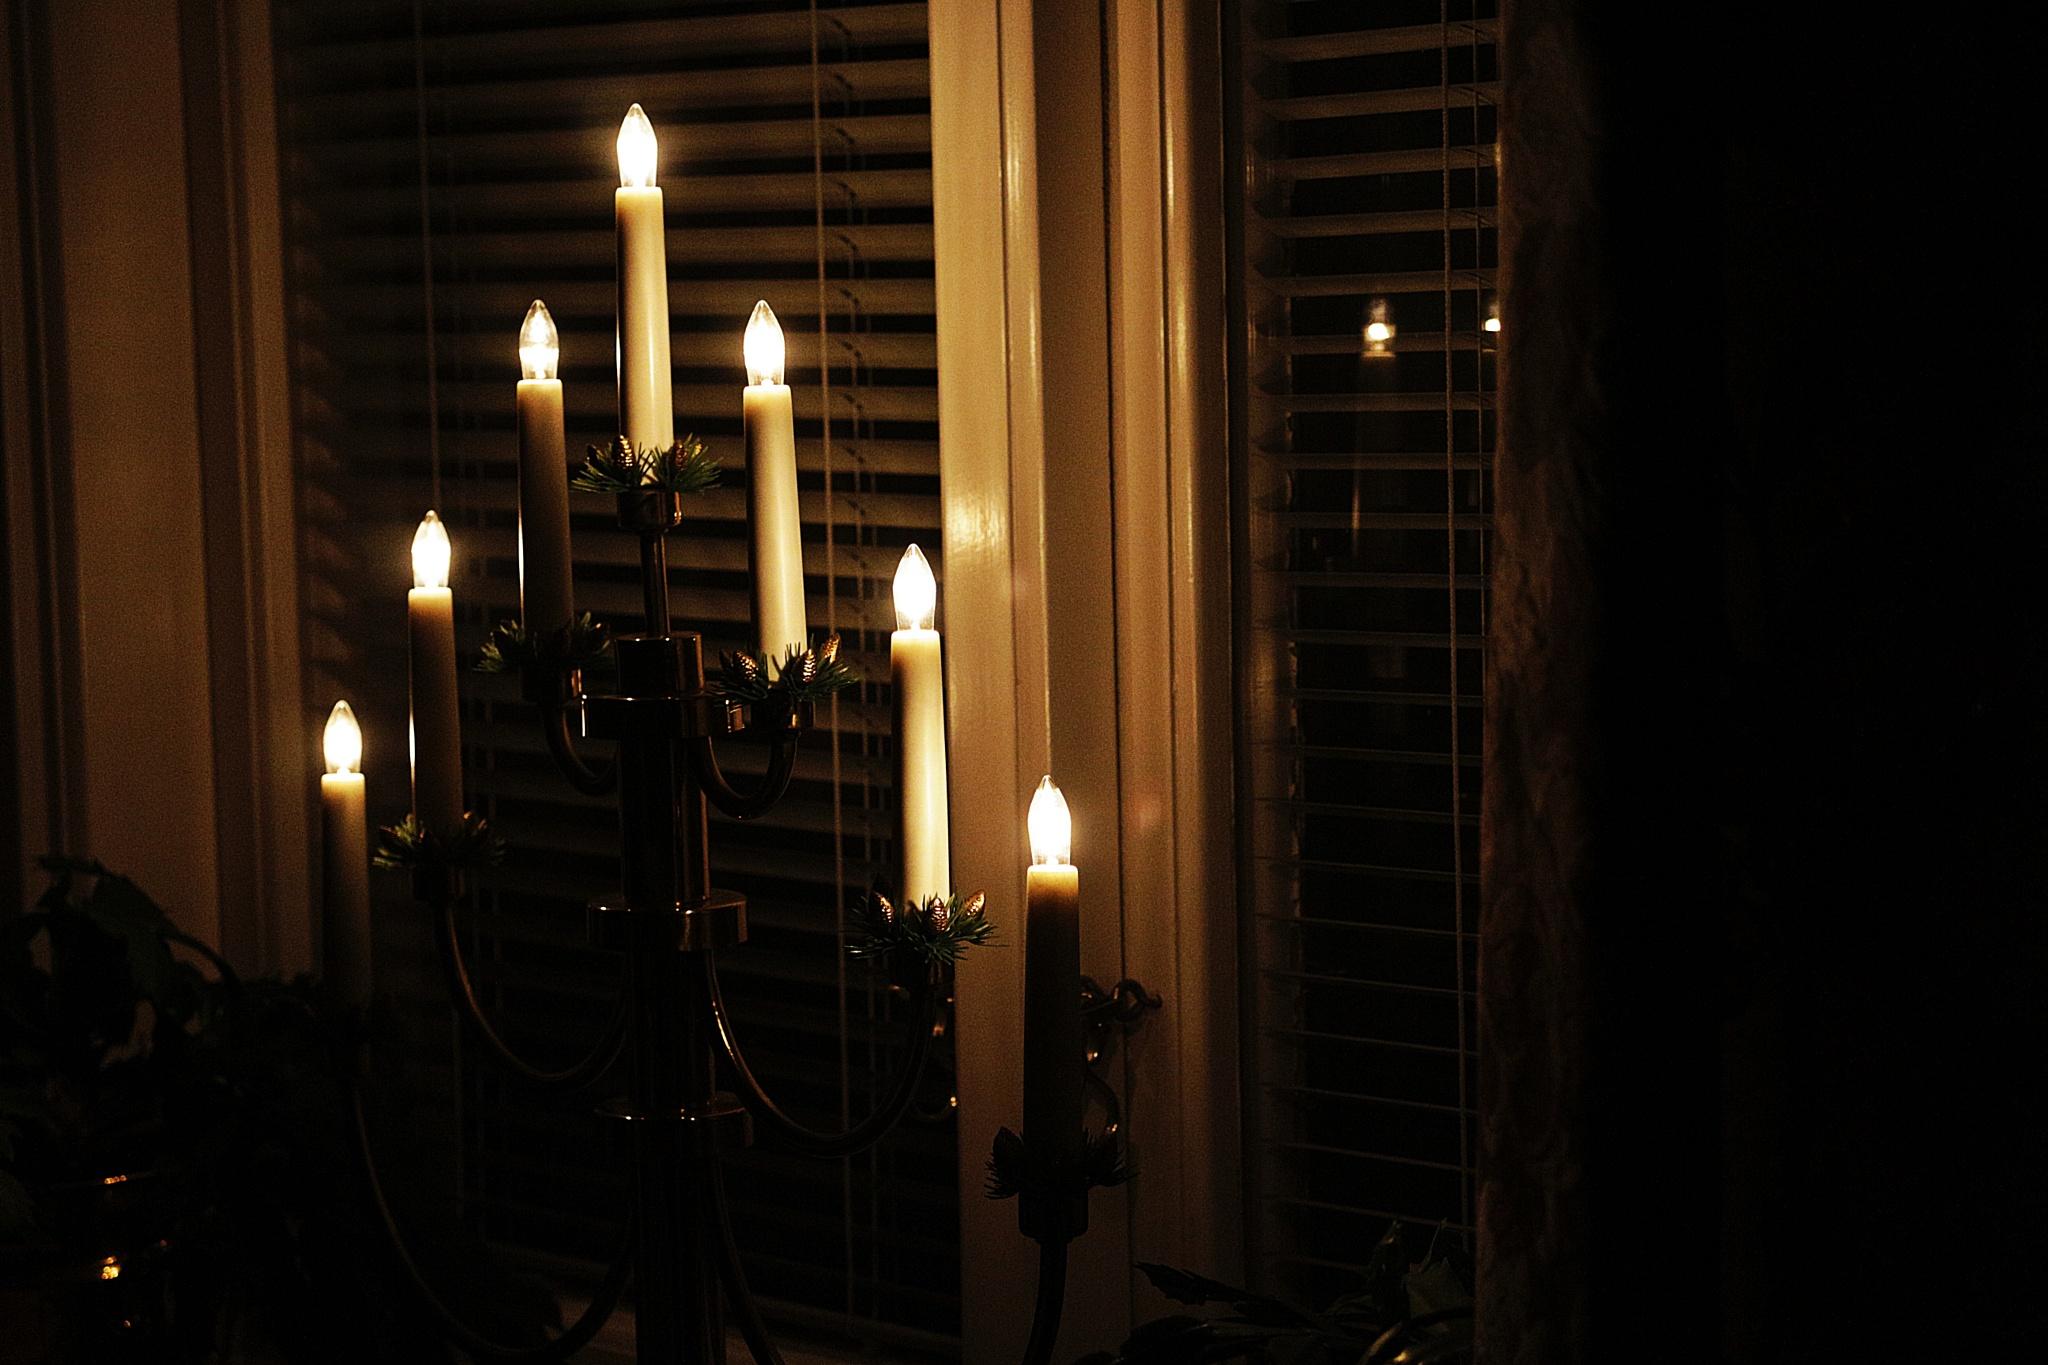 Lighting up the window... by AllShapesOfArt